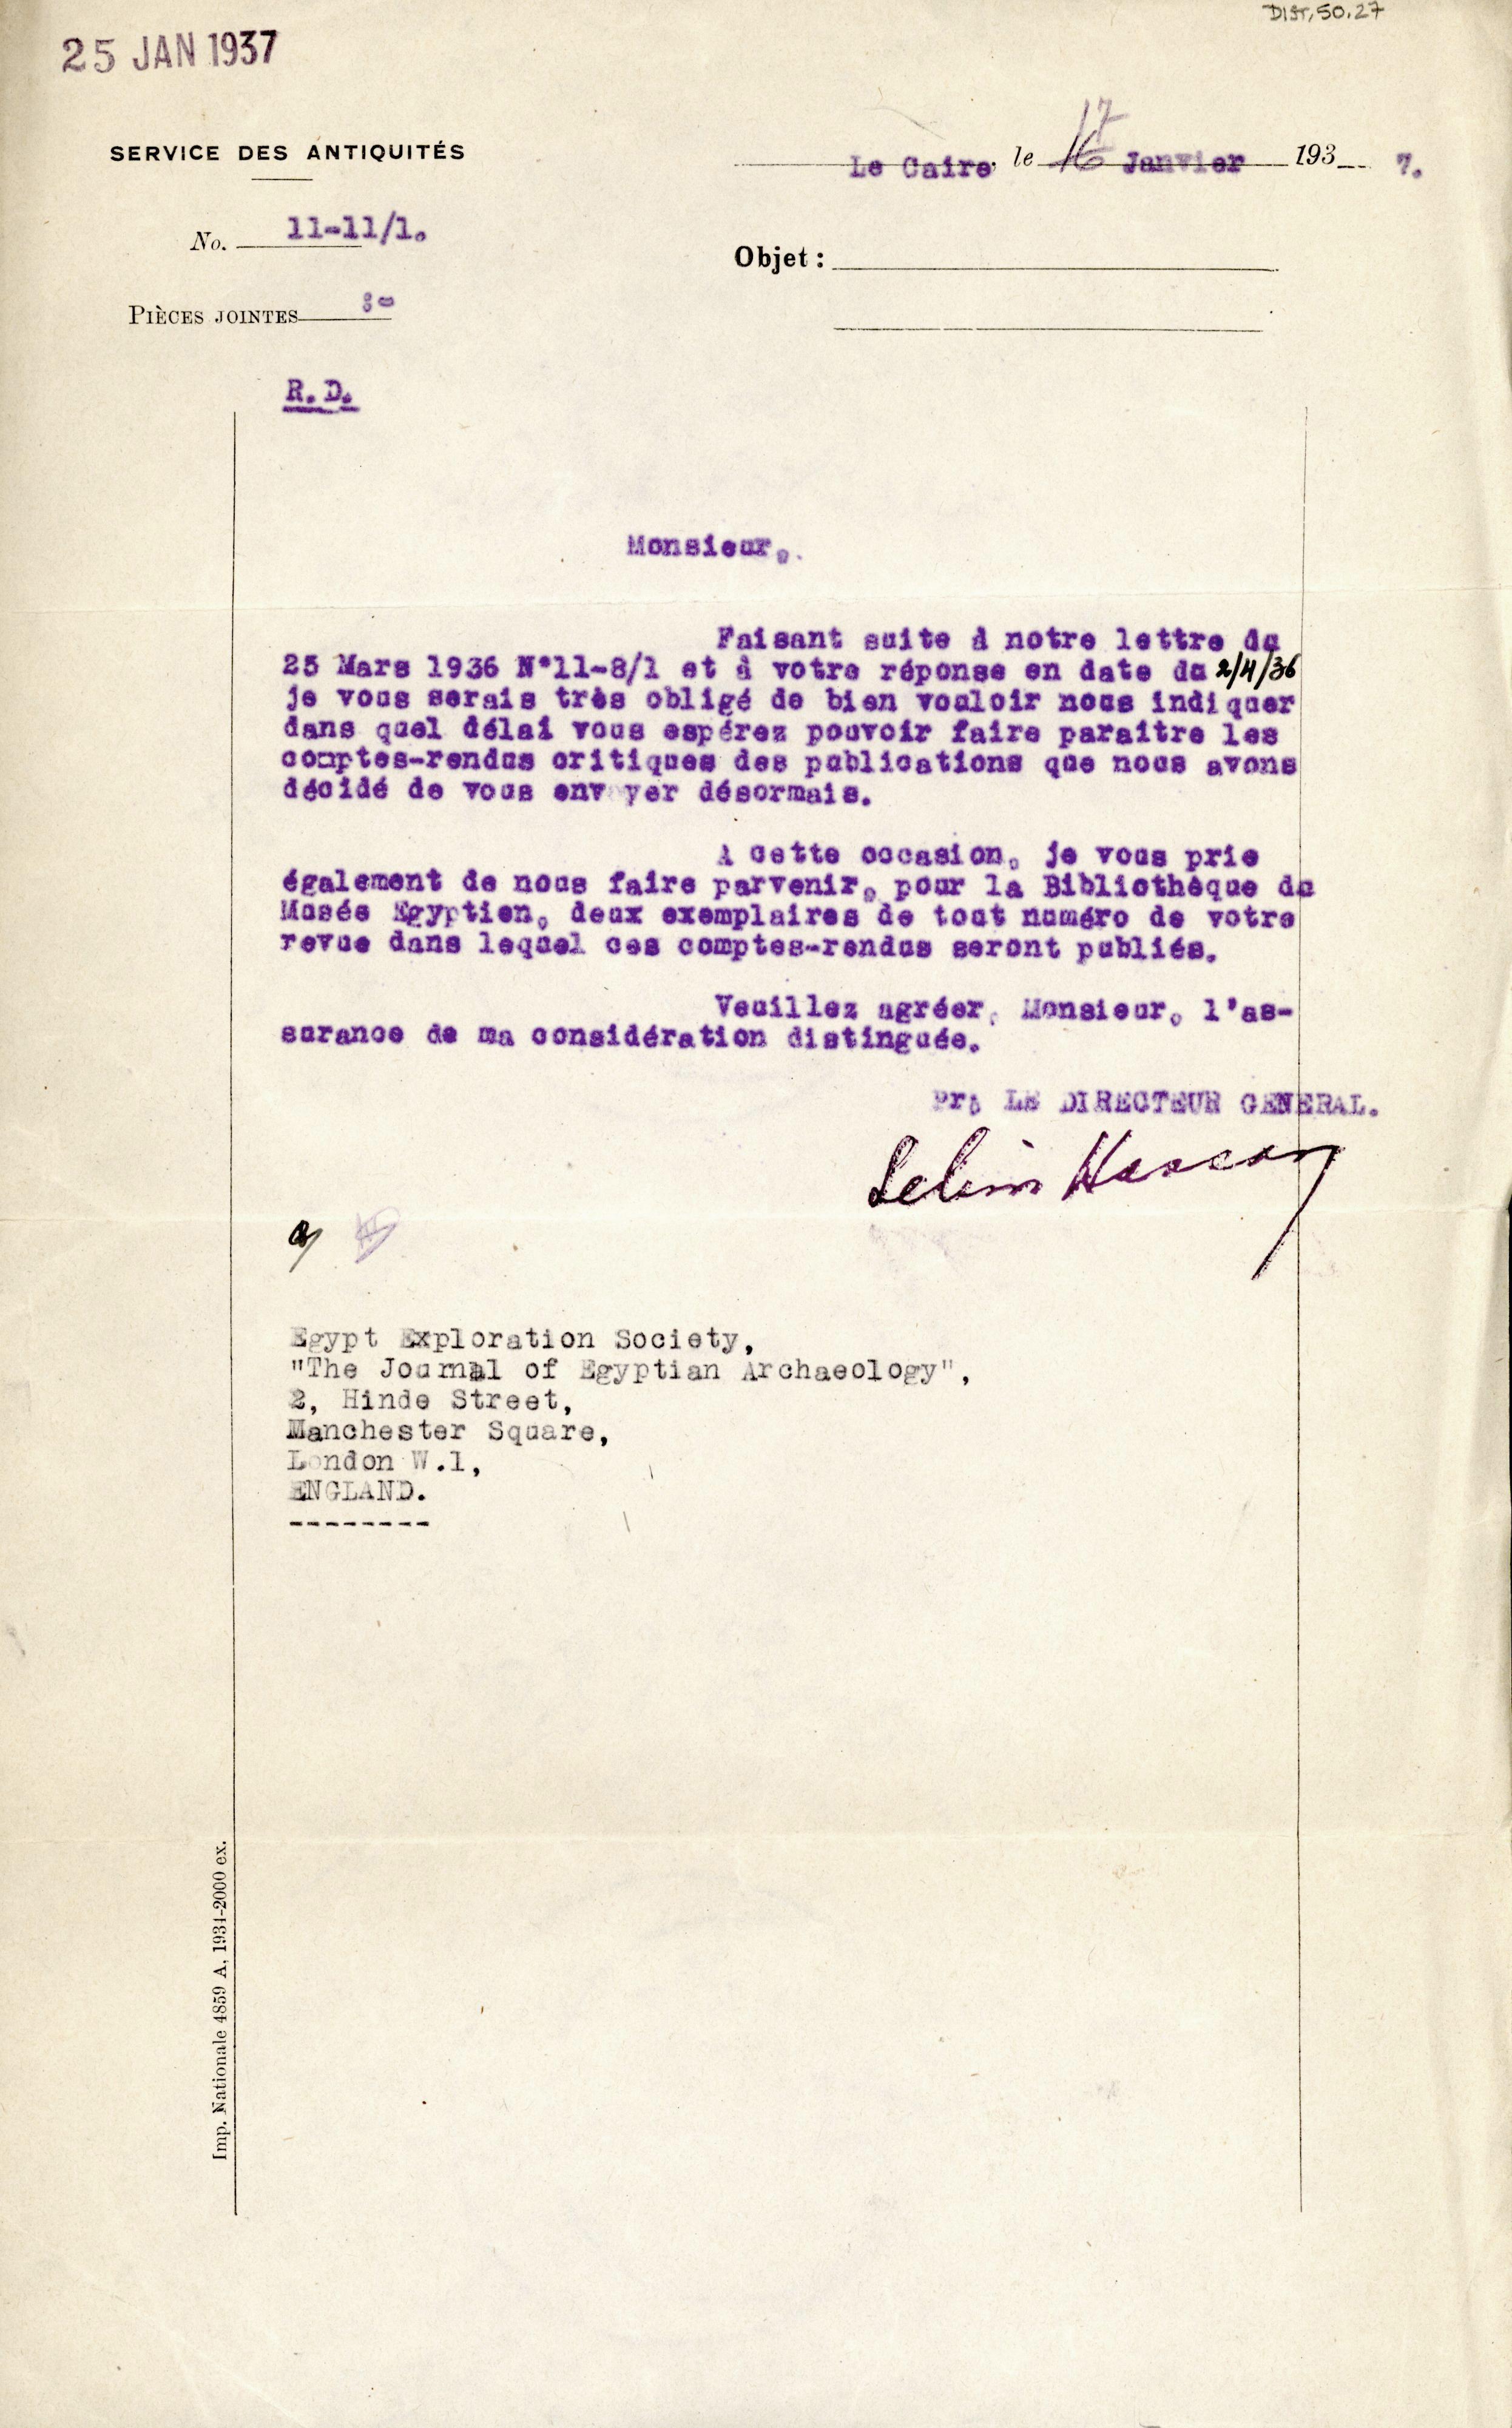 1926-39 correspondence with Antiquities Service DIST.50.27